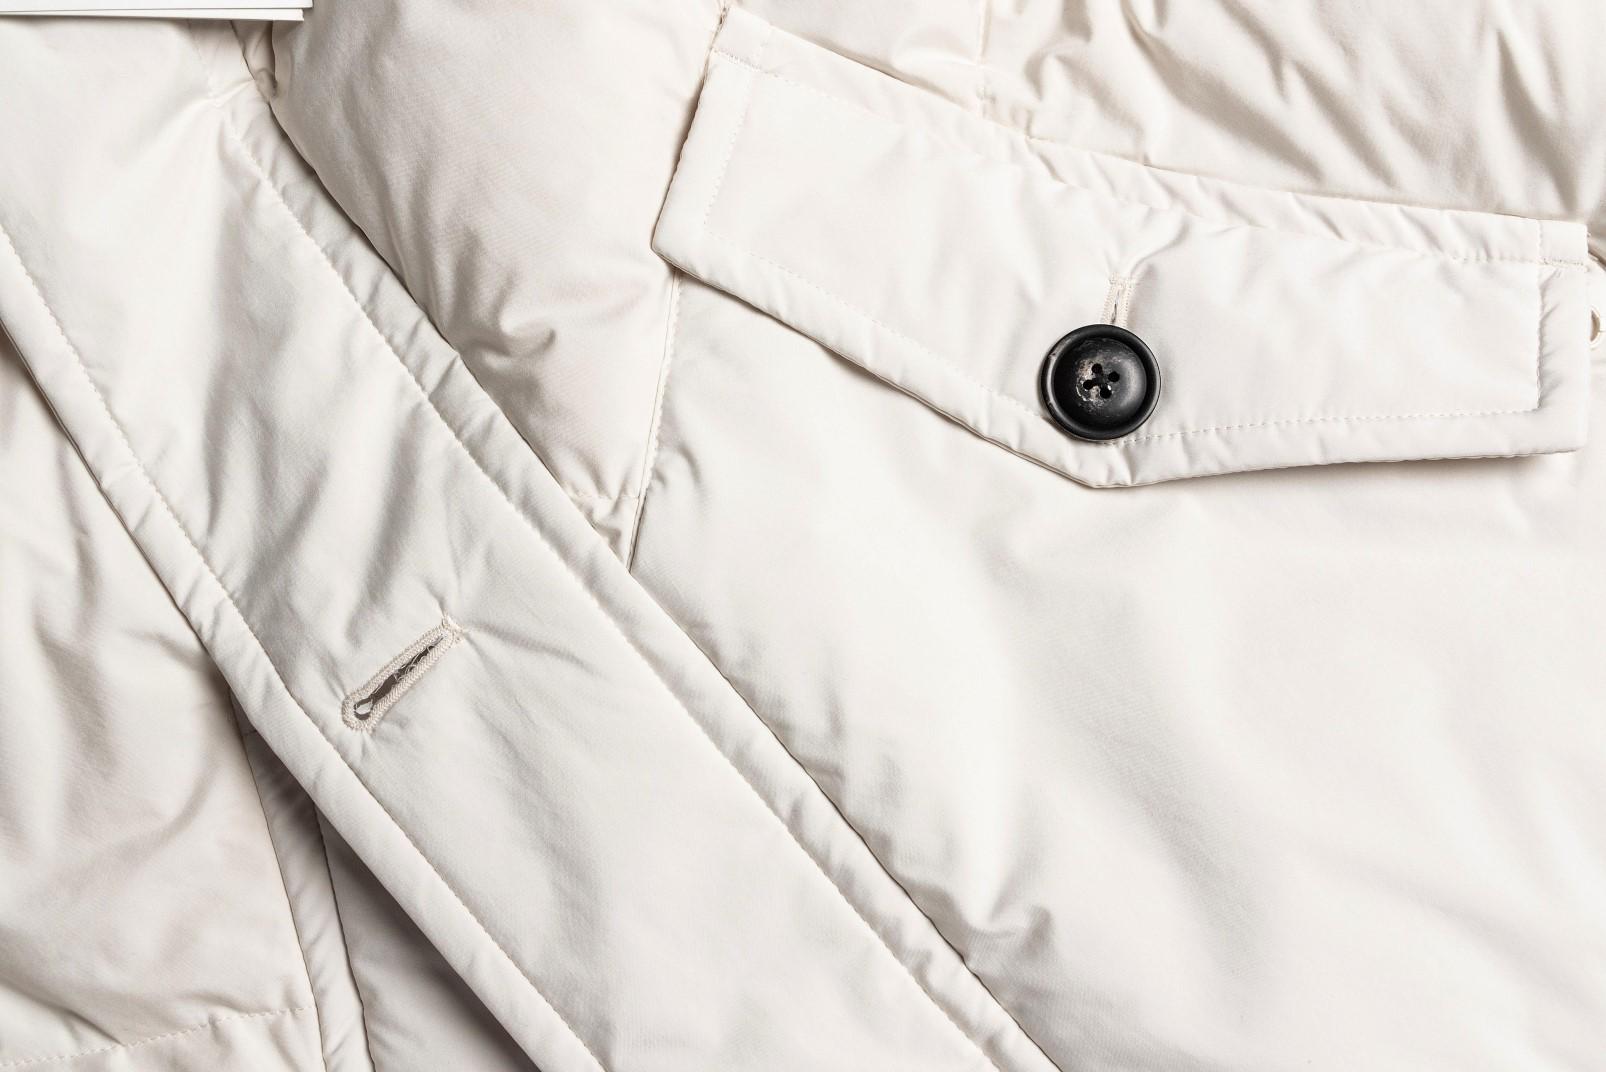 Parka bianco dettaglio tasca e bottoni